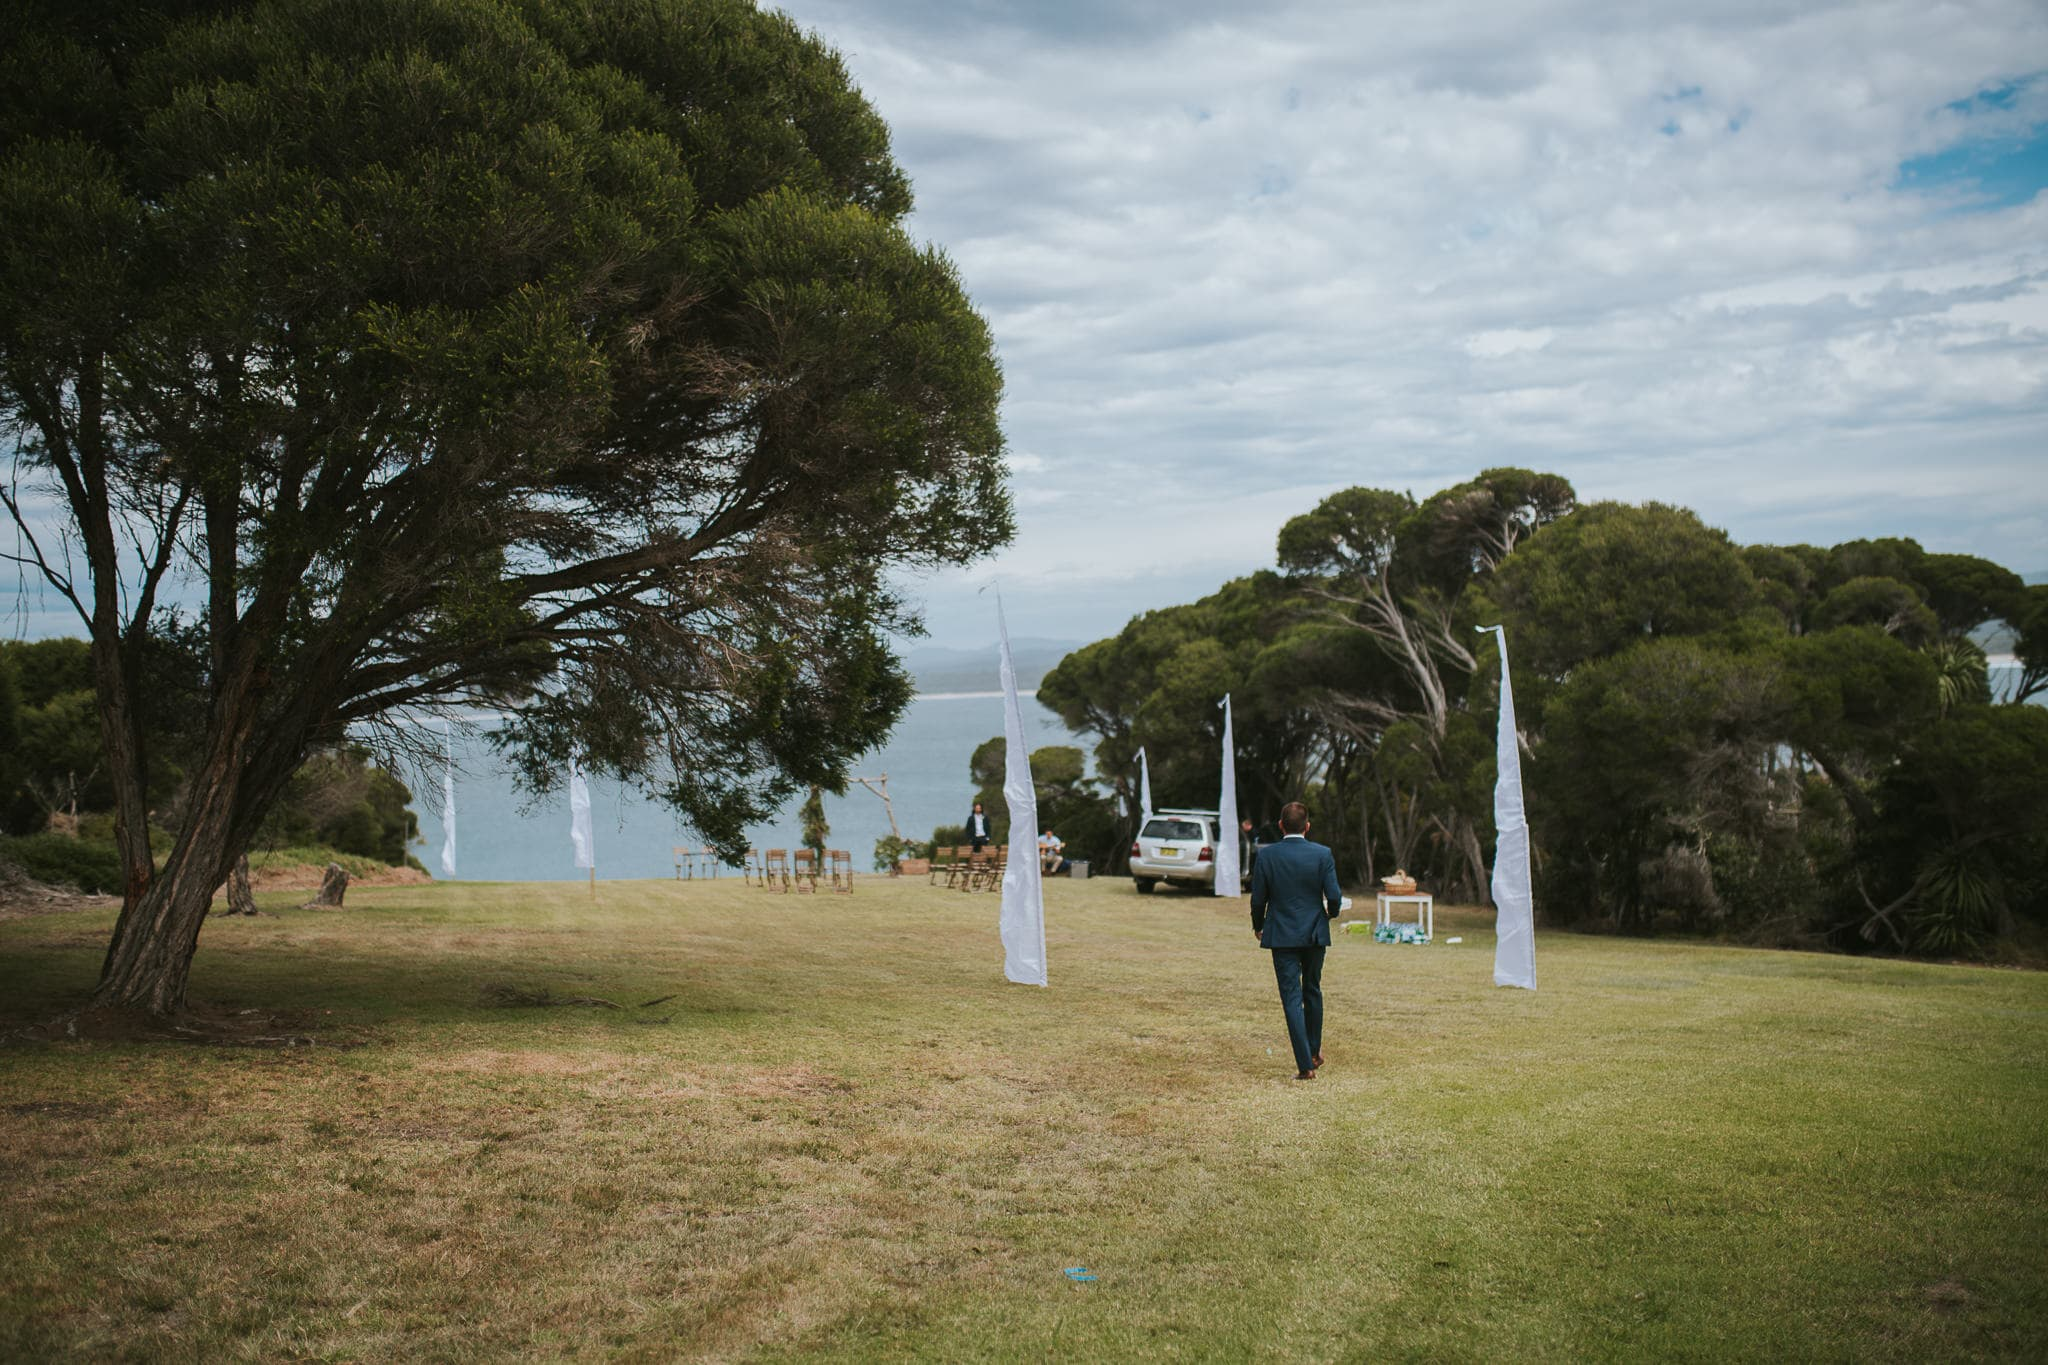 Justin Kunimoto photography Australia New south Wales bega merimbula nsw